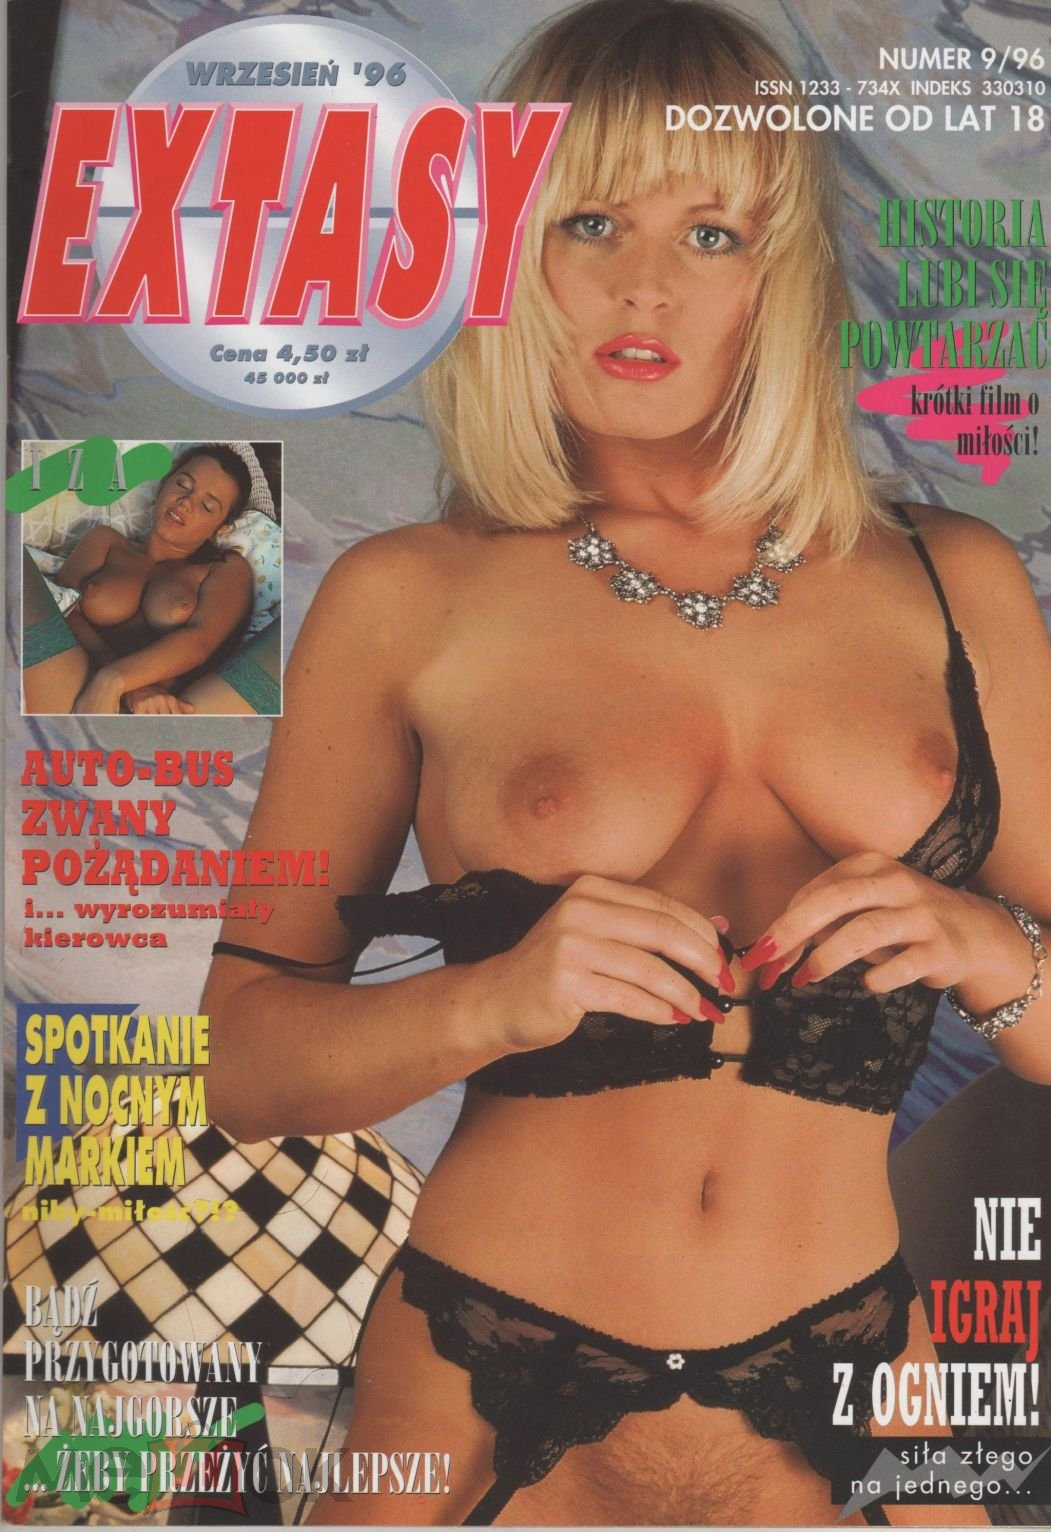 Секс журналы картинки фото девчонок